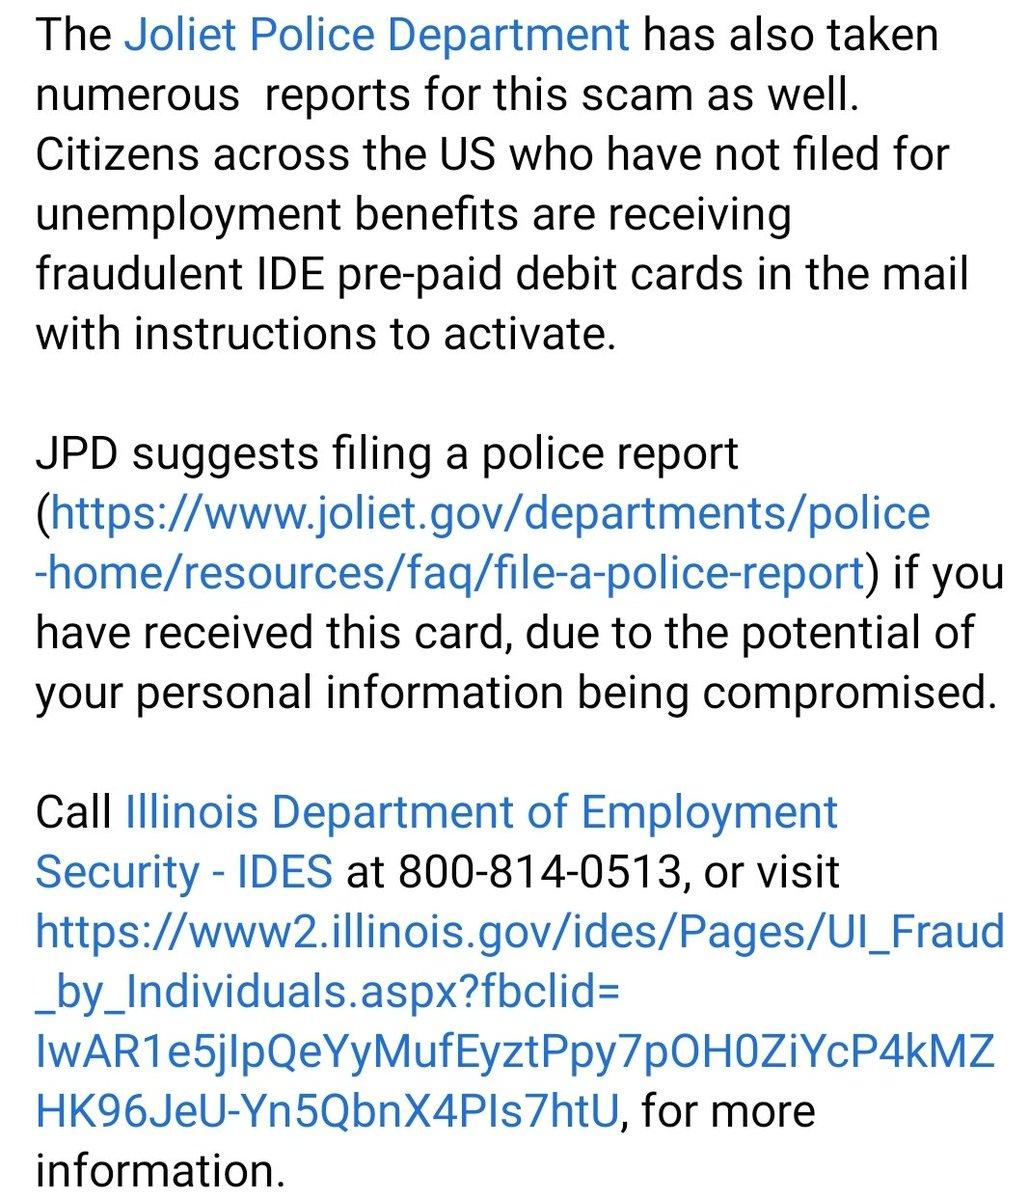 Joliet Police Department On Twitter Scam Alert Jolietpolice Have Taken Numerous Reports Regarding Fraudulent Unemployment Benefit Pre Paid Debit Cards From Illinoisides Https T Co Hq64njjnzo